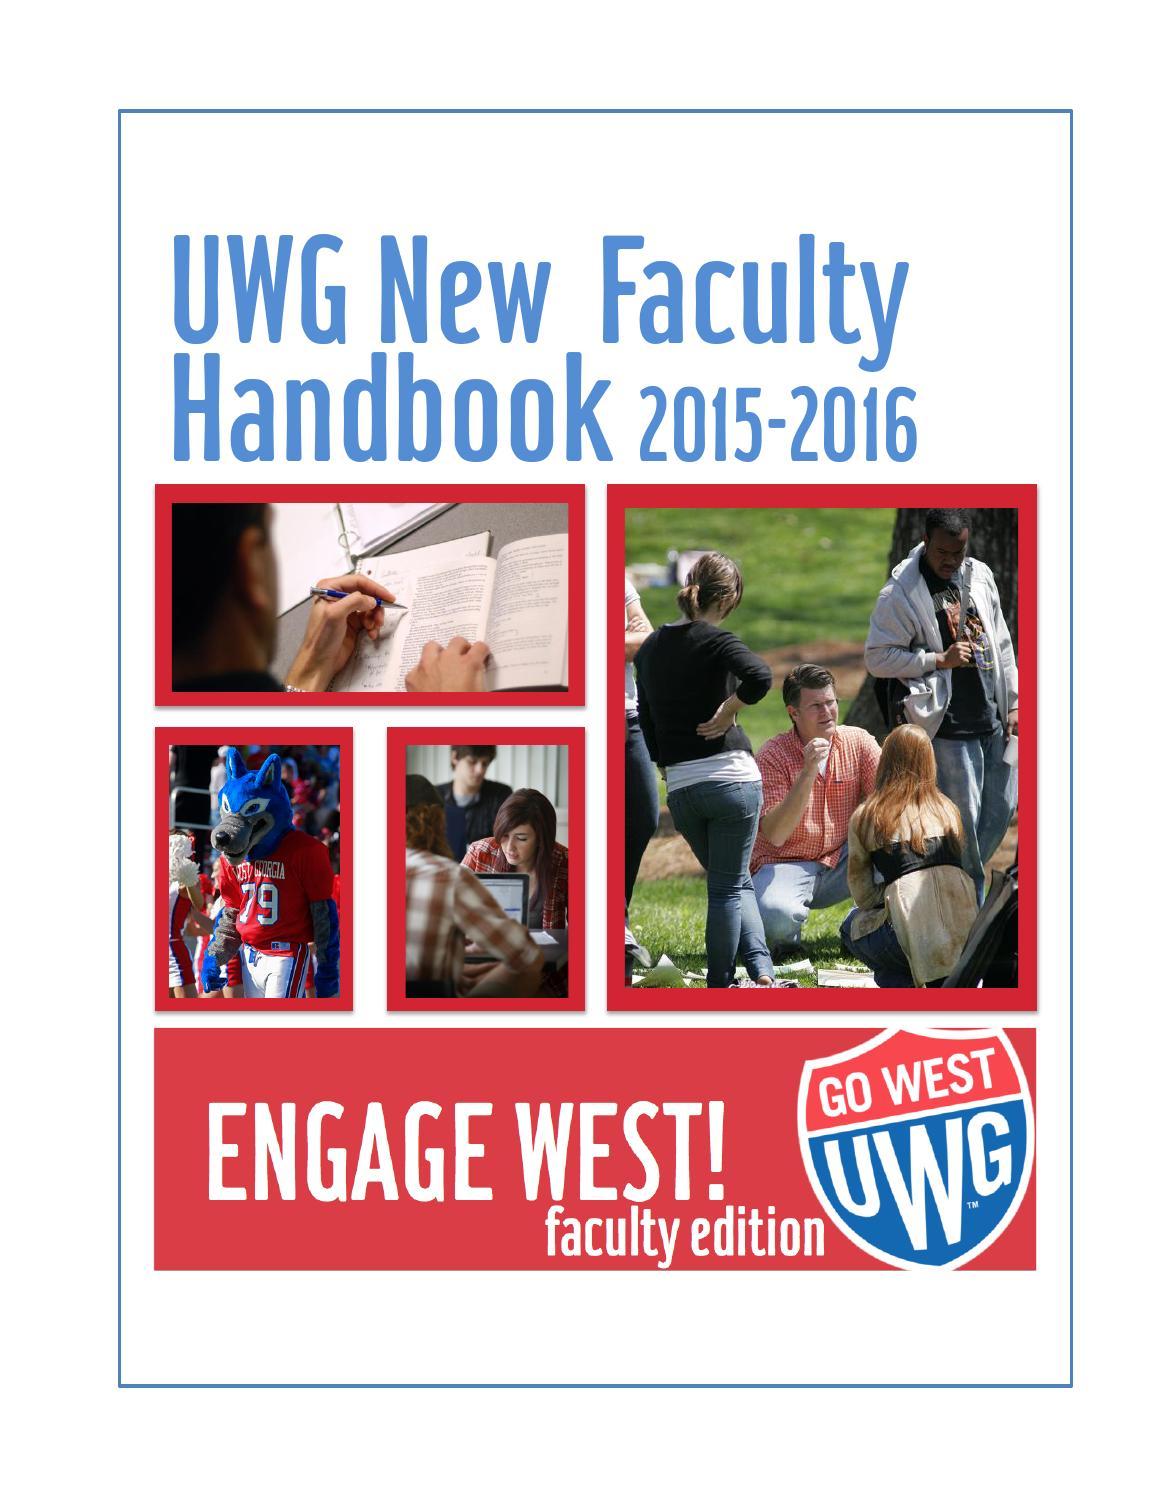 ferpa form uwg  New Faculty Handbook 7-7 by Cher Hendricks - issuu